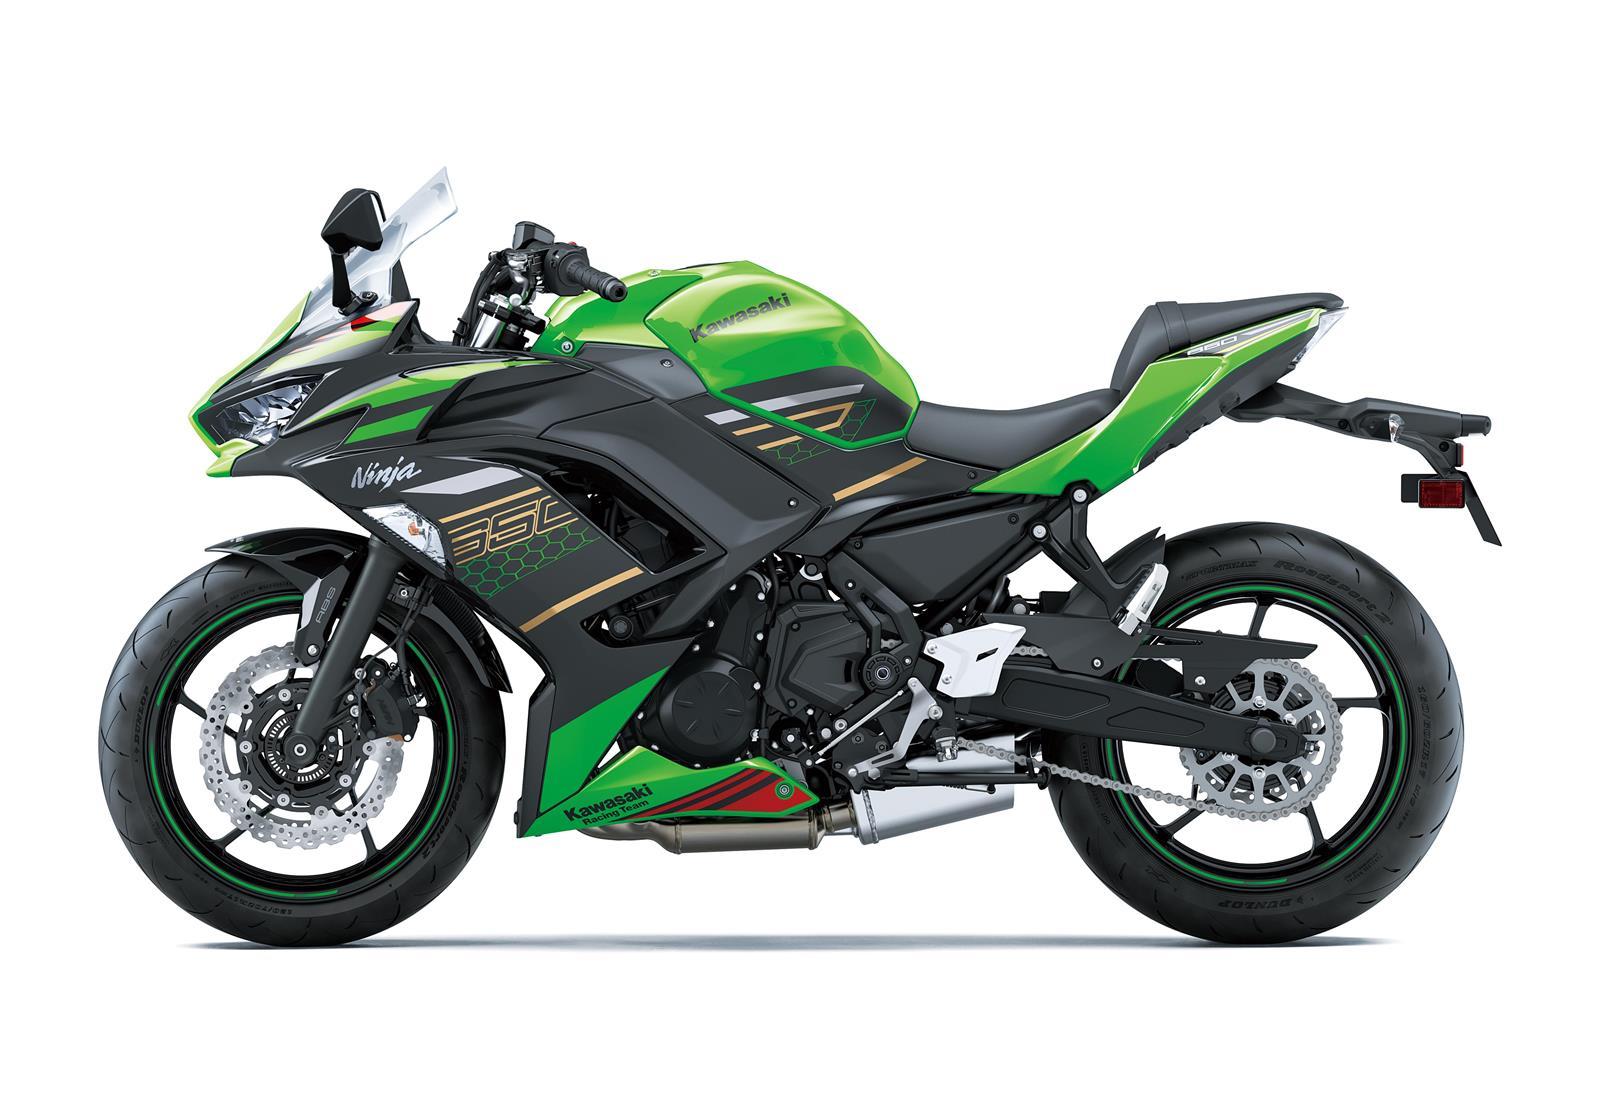 Ninja 650 My 2020 Kawasaki Europe